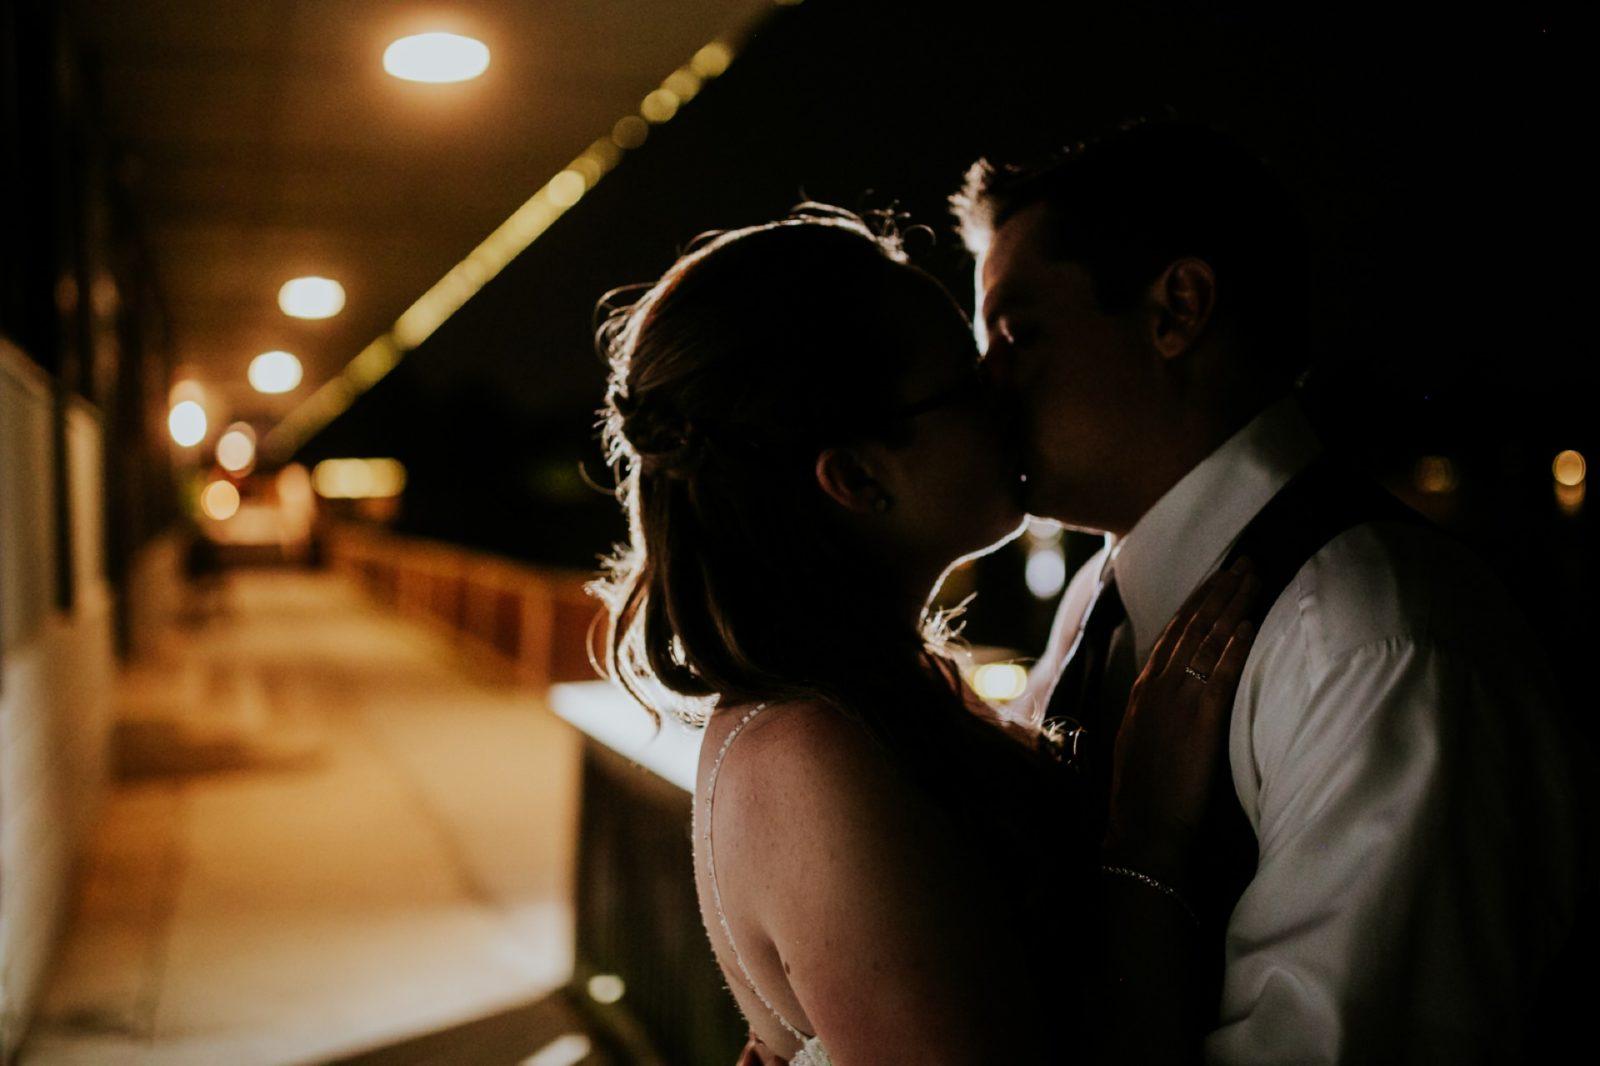 charming-willows-wedding_075-1600x1066.jpg